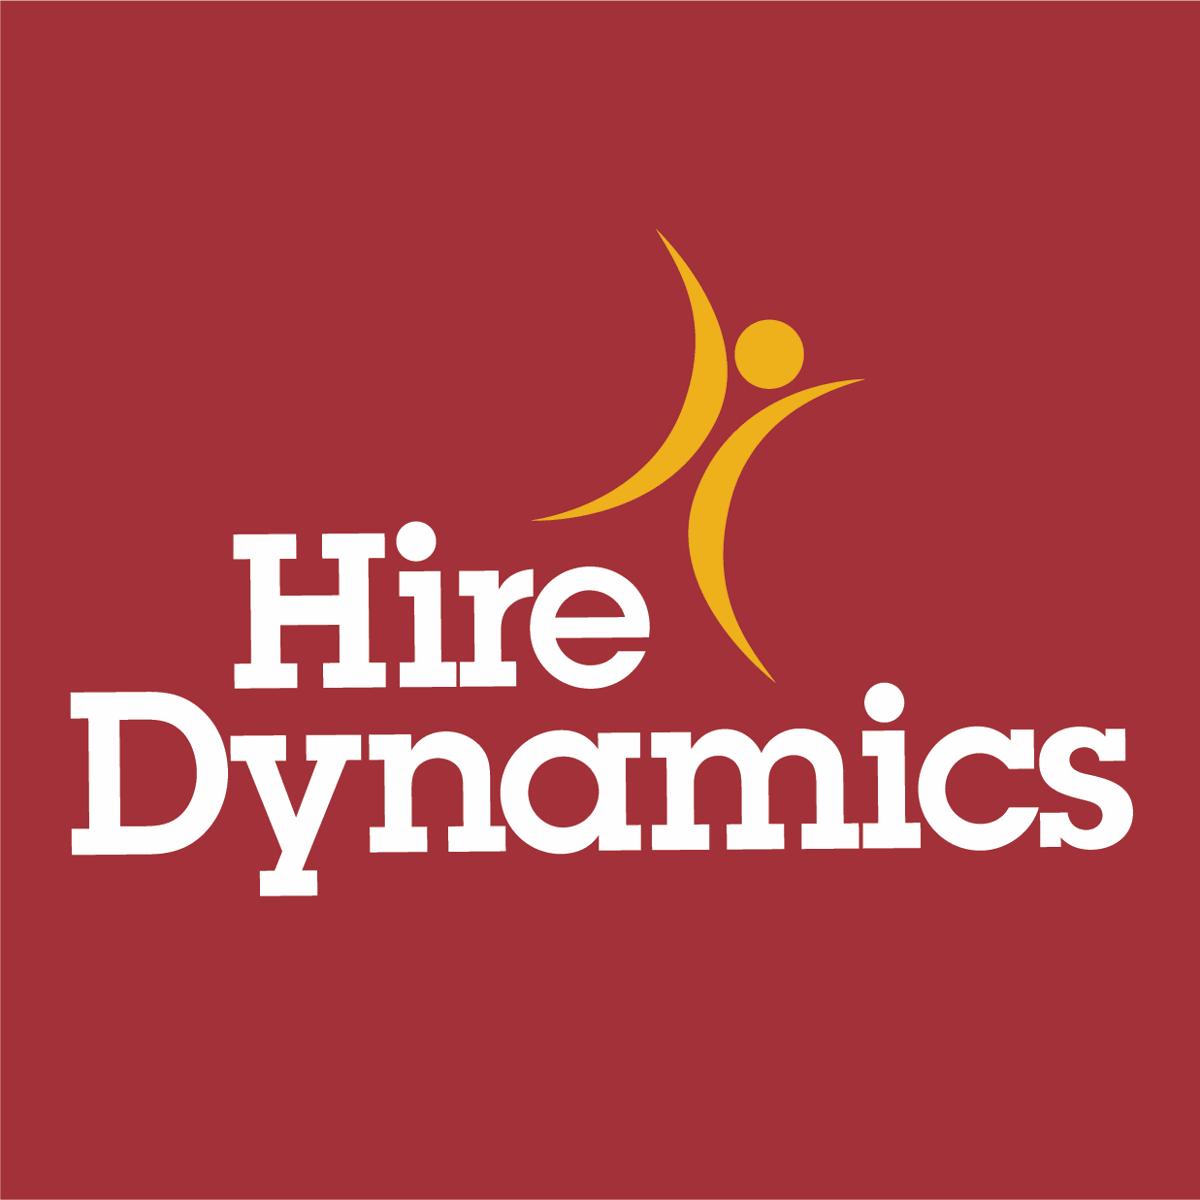 Hire Dynamics